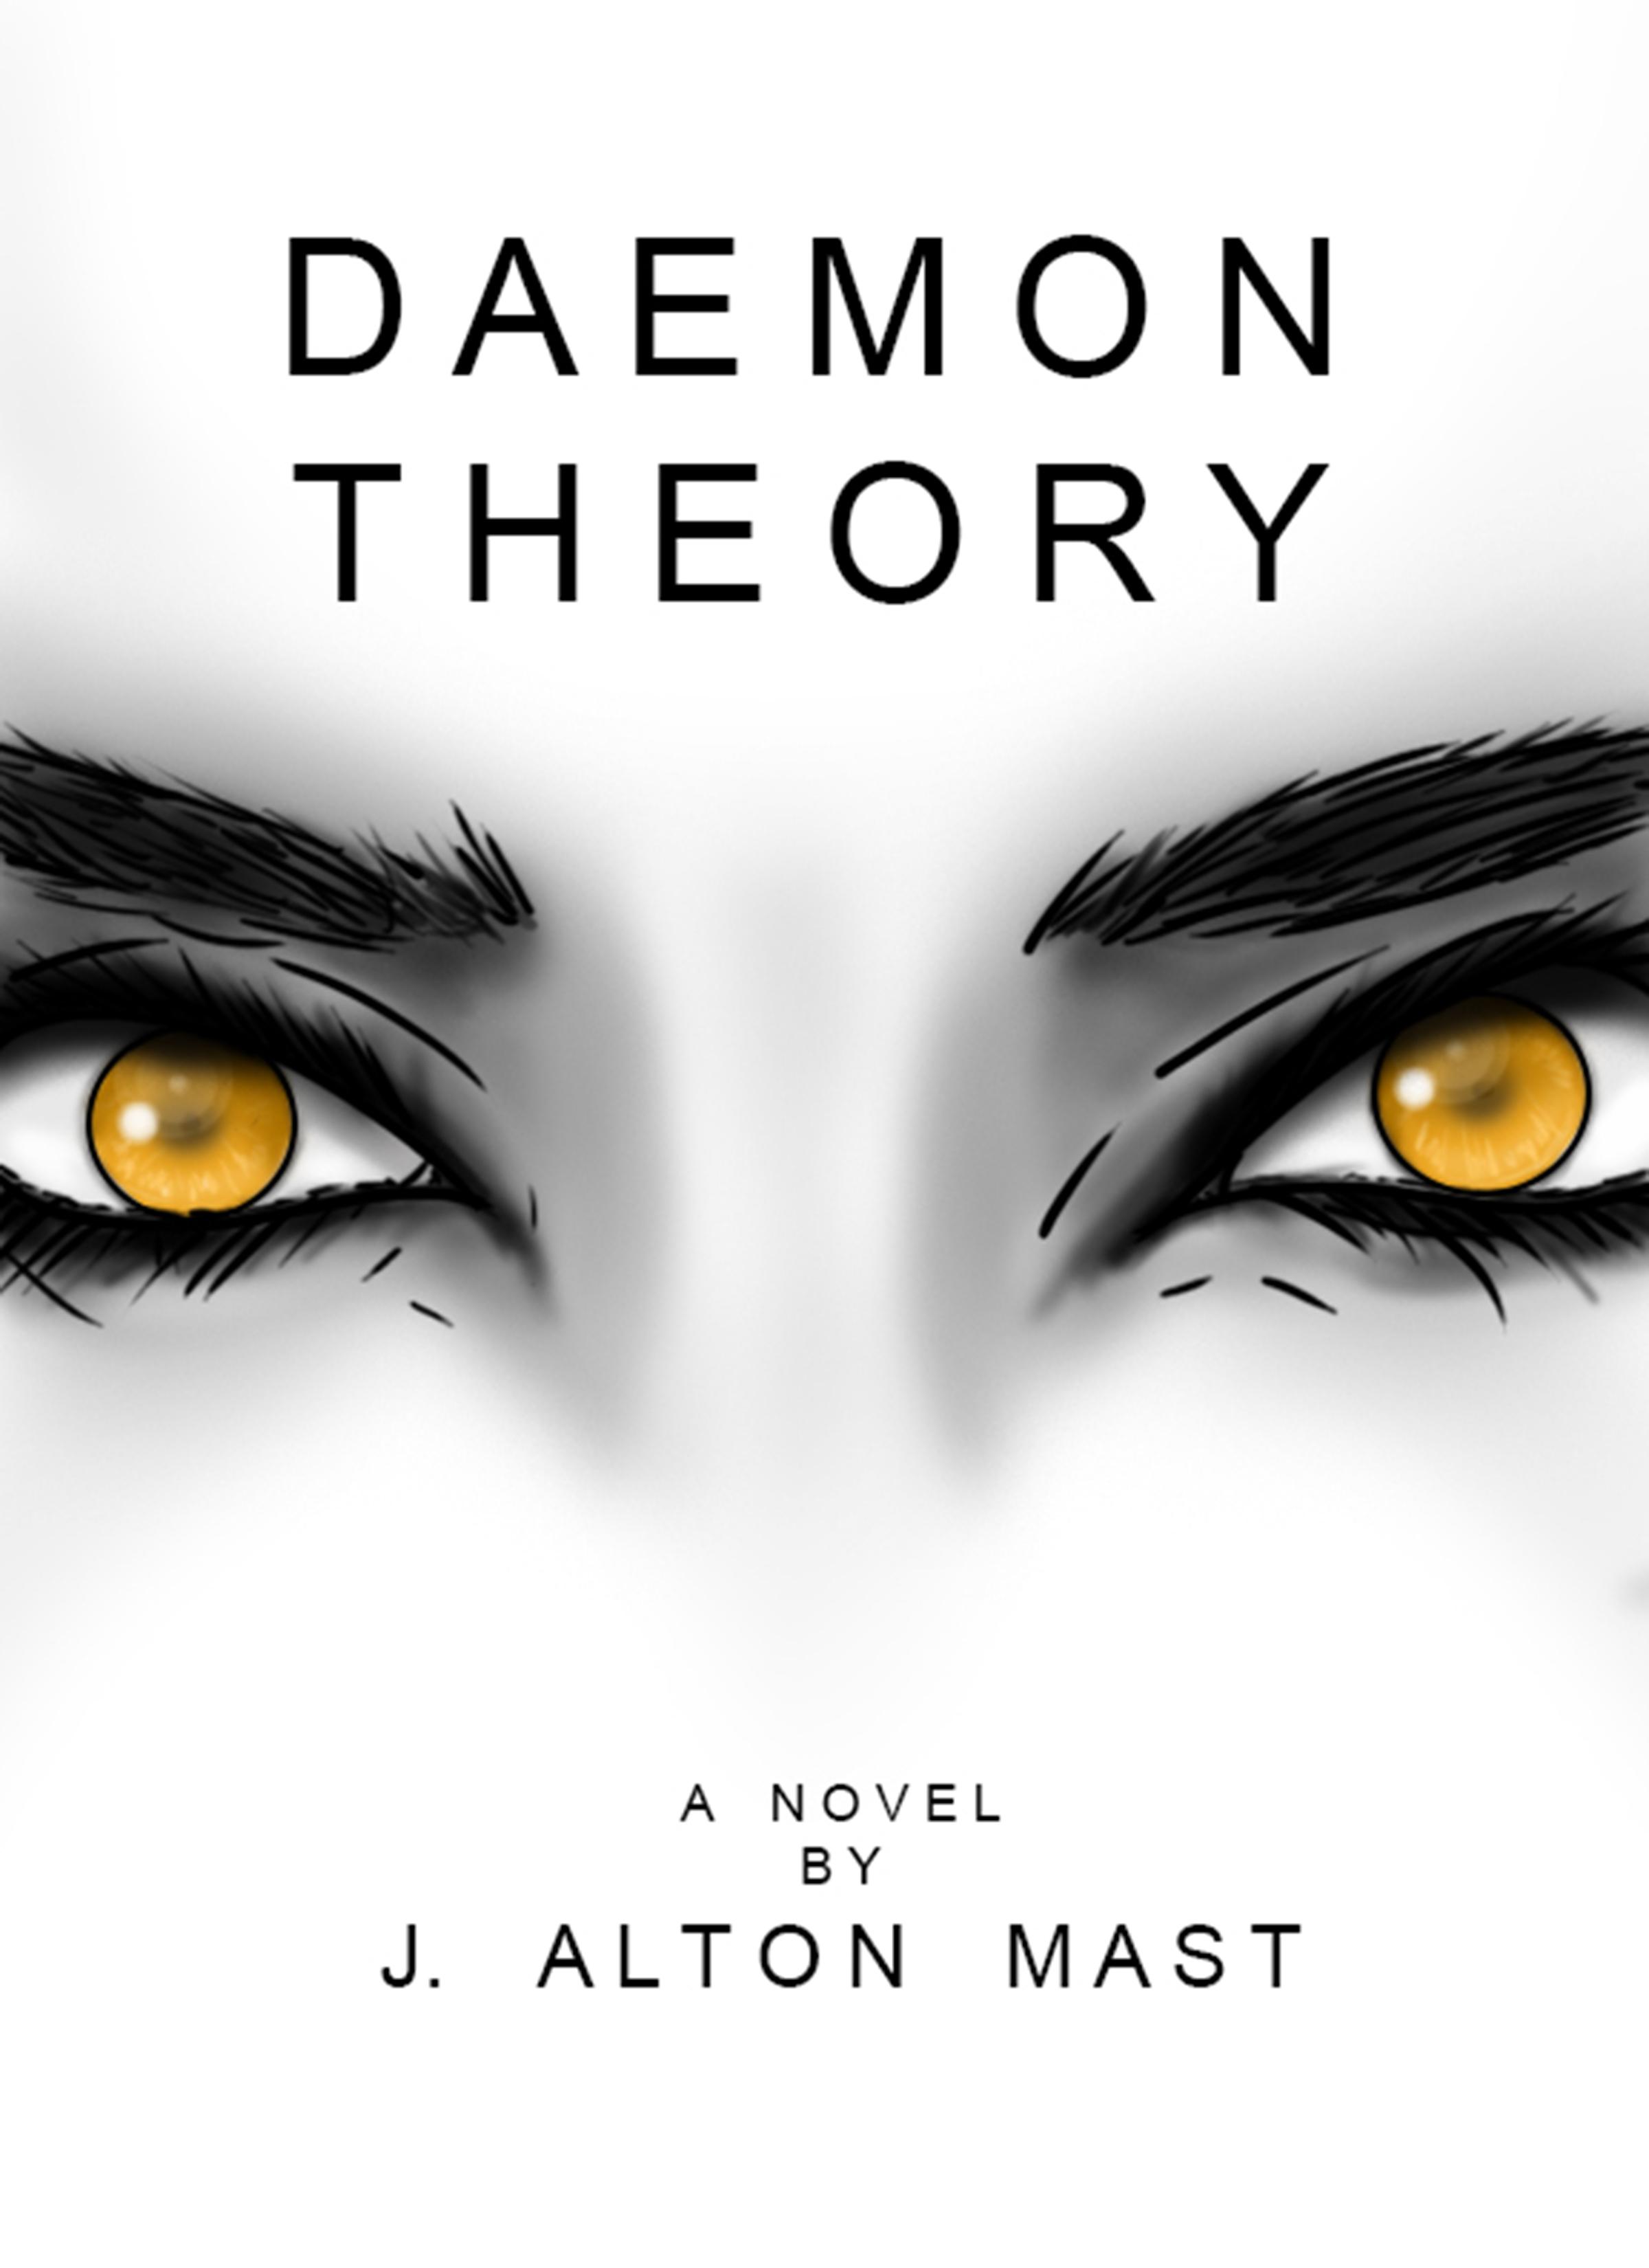 Daemon Theory by J. Alton Mast #inksmith